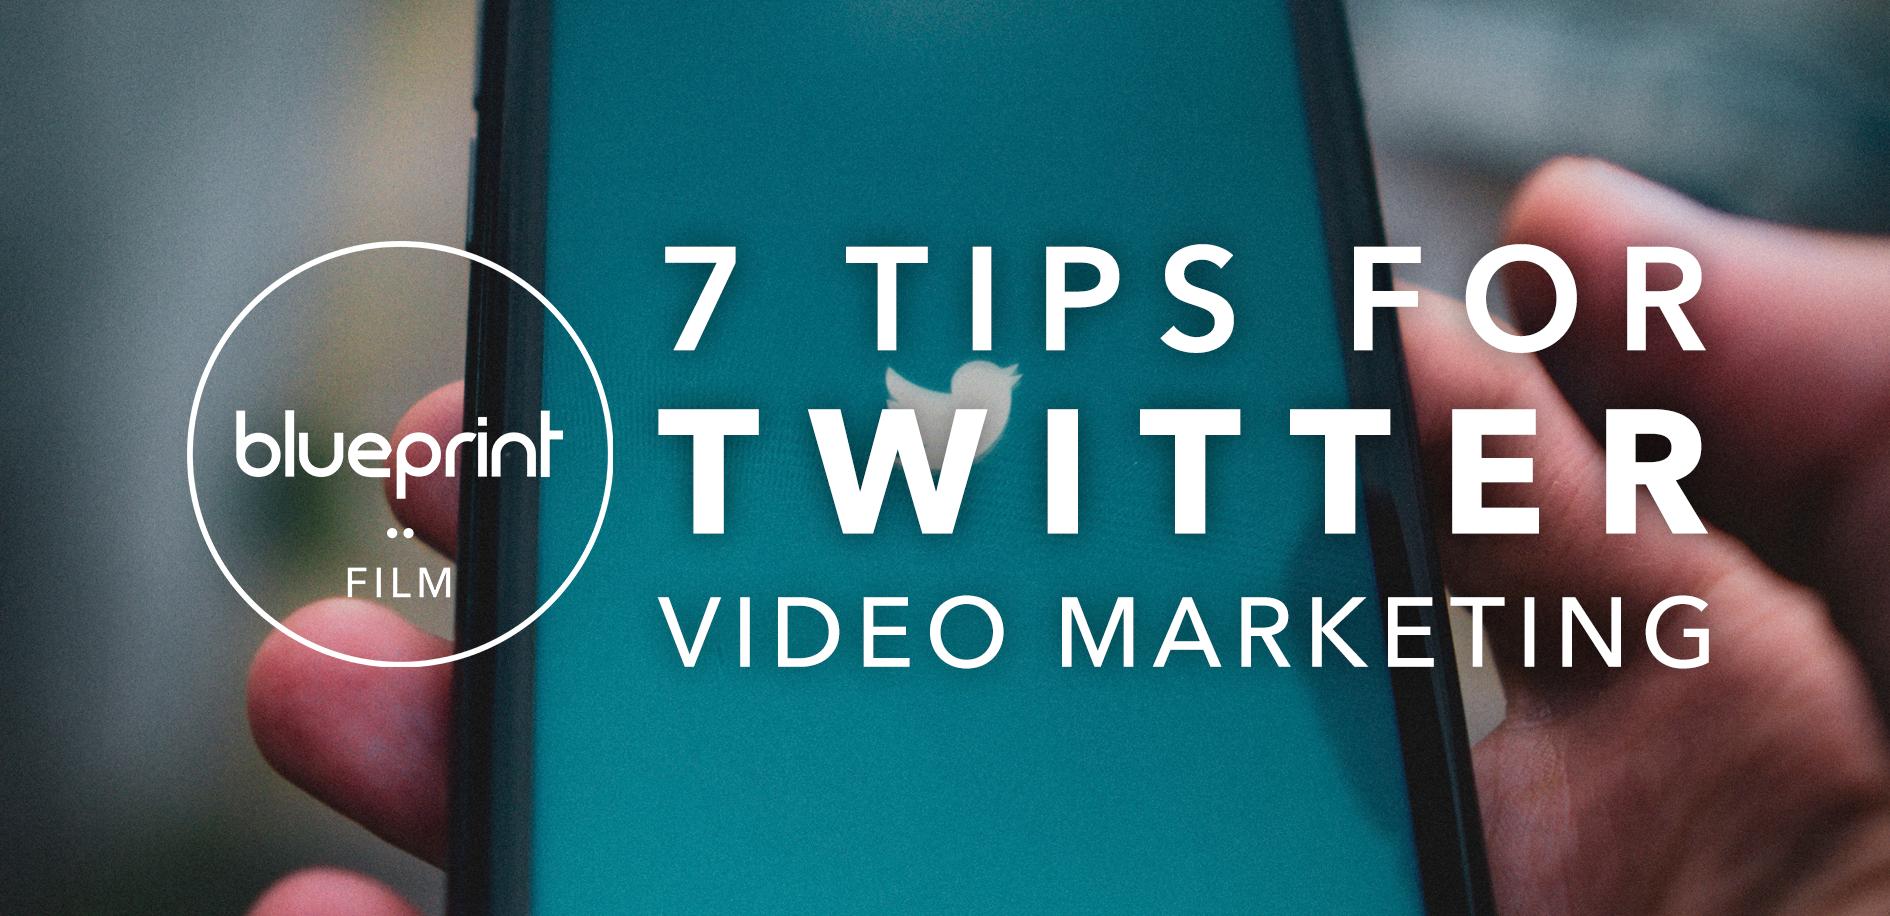 7 tips for twitter video marketing